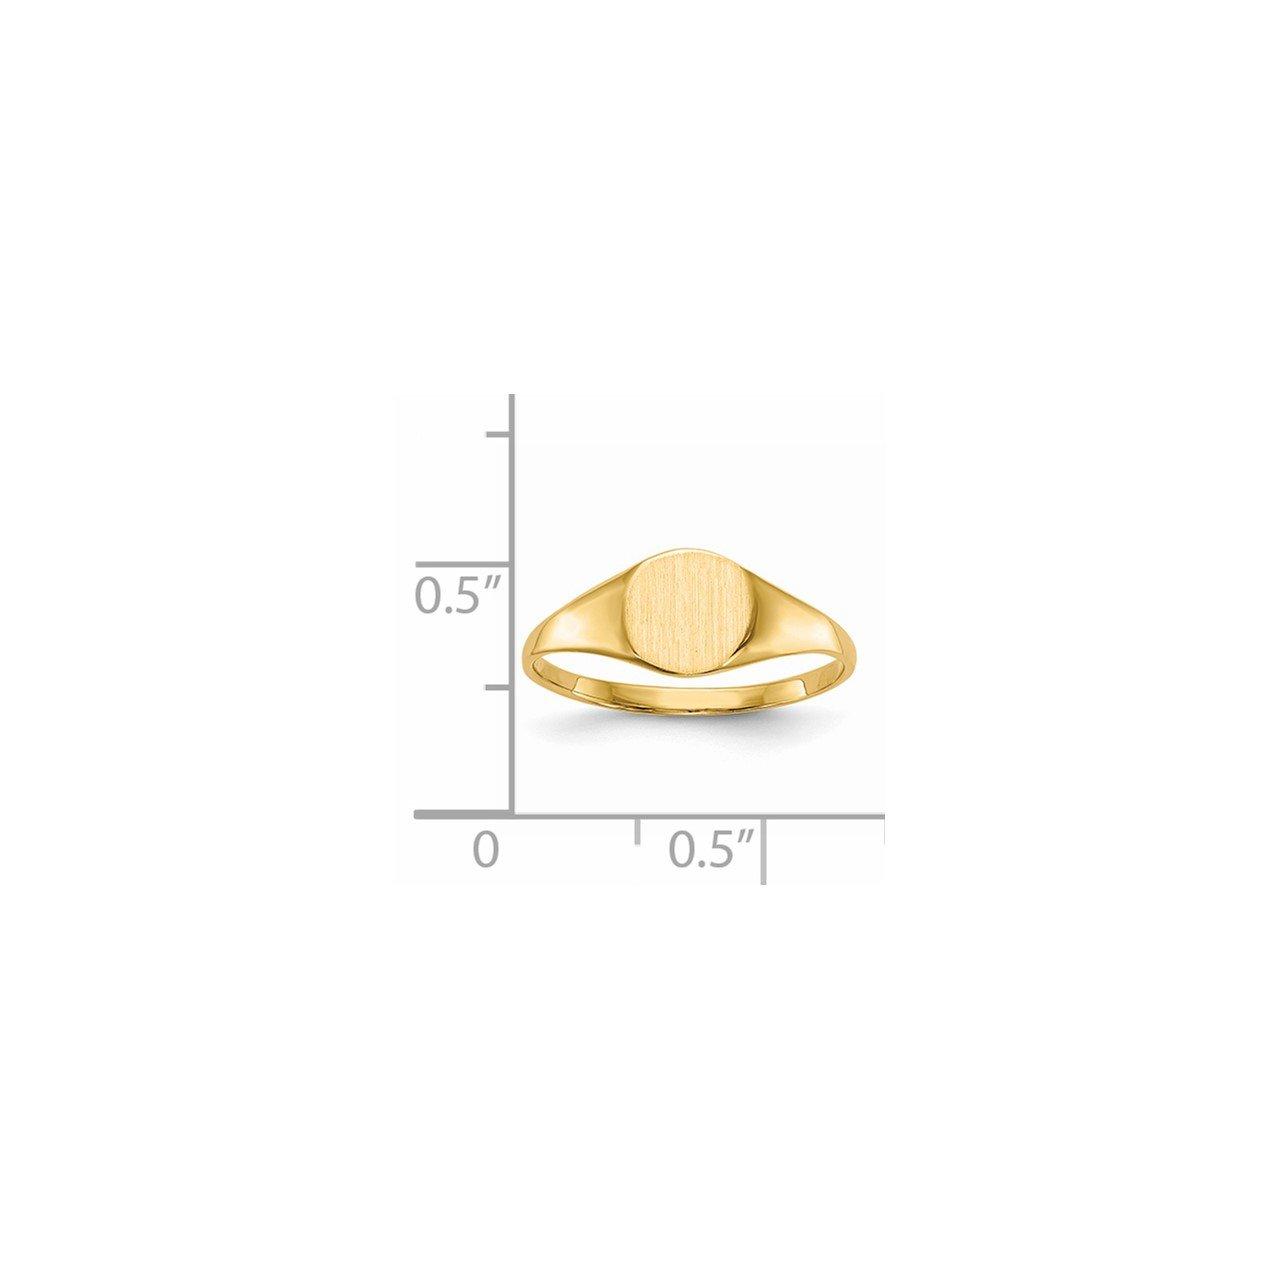 14k 6.5x7.5mm Closed Back Signet Ring-4